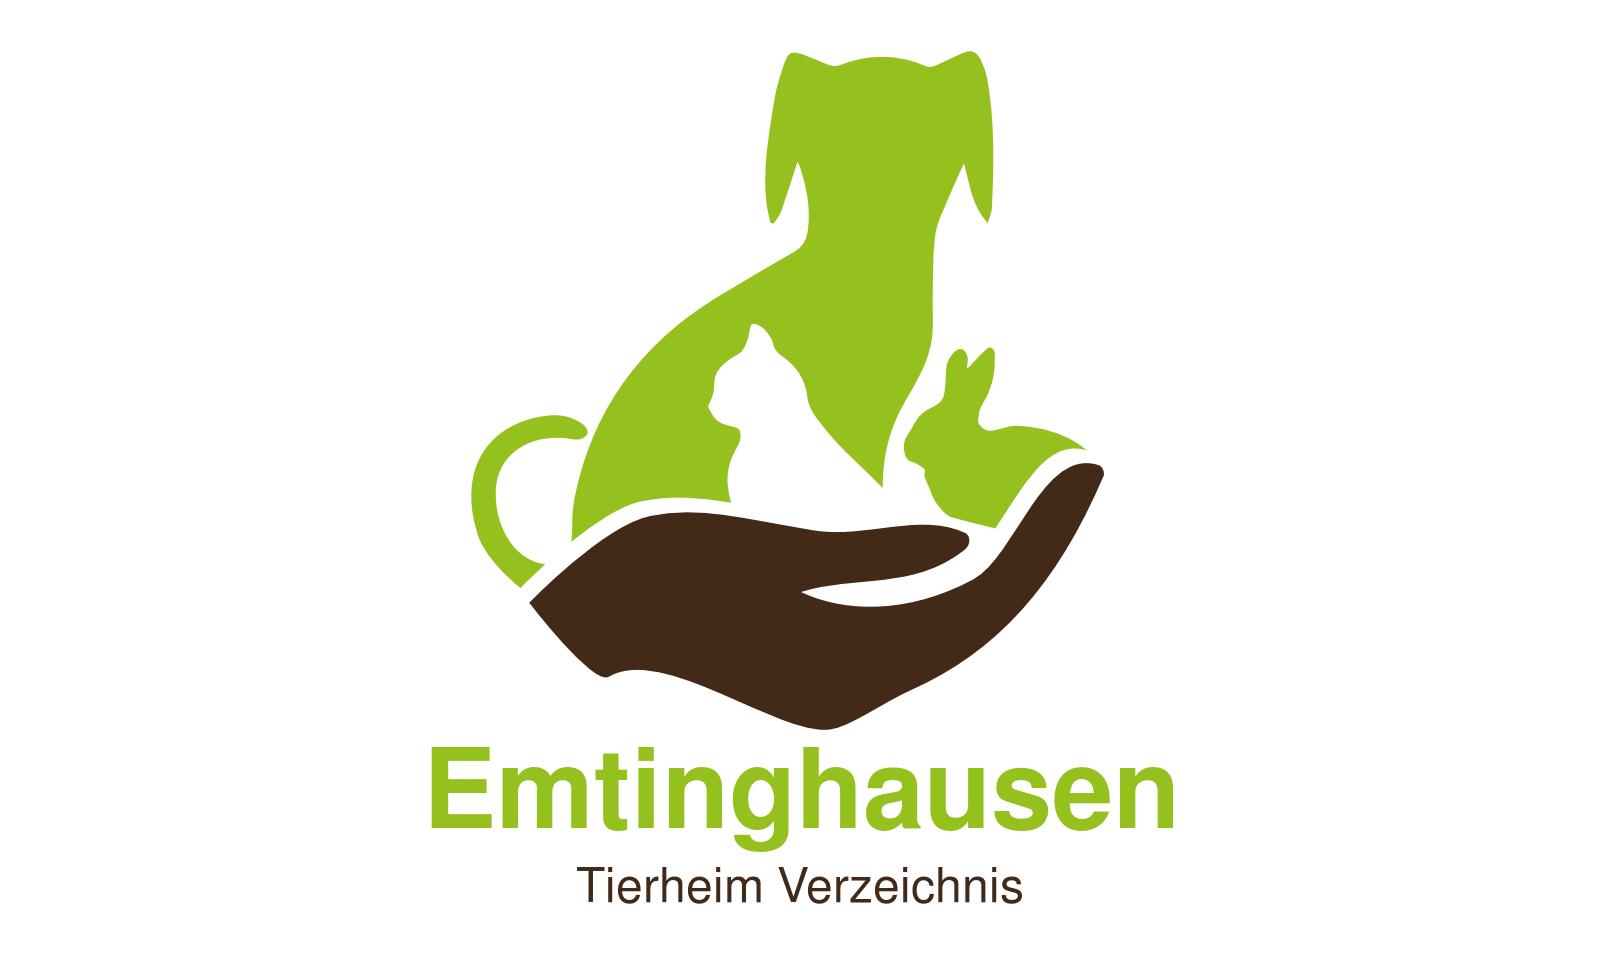 Tierheim Emtinghausen